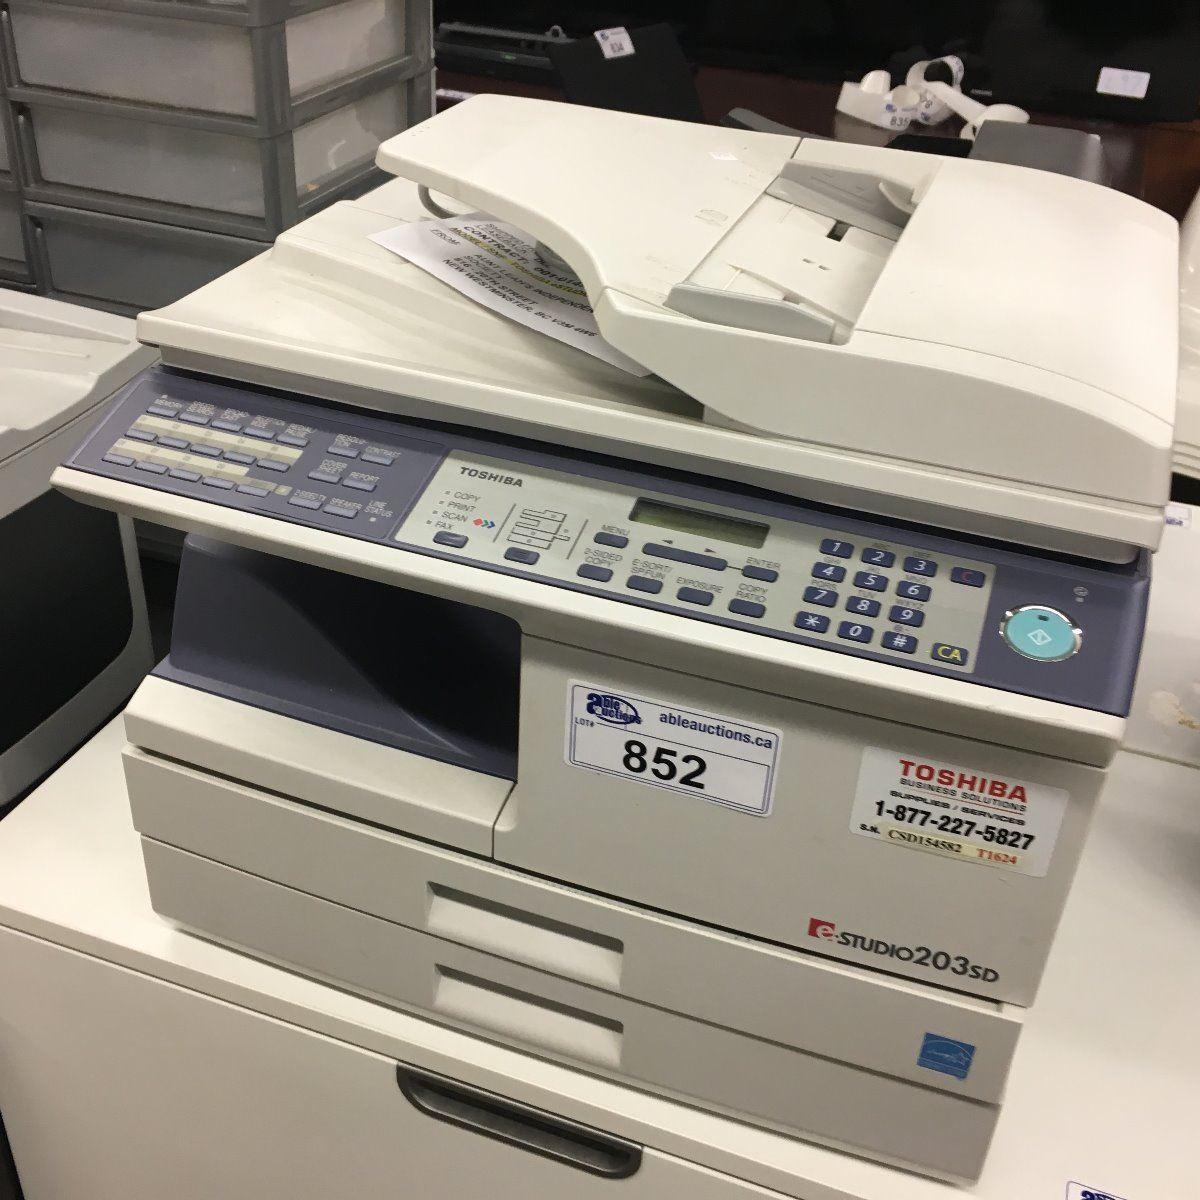 TOSHIBA E STUDIO 203SD WINDOWS DRIVER